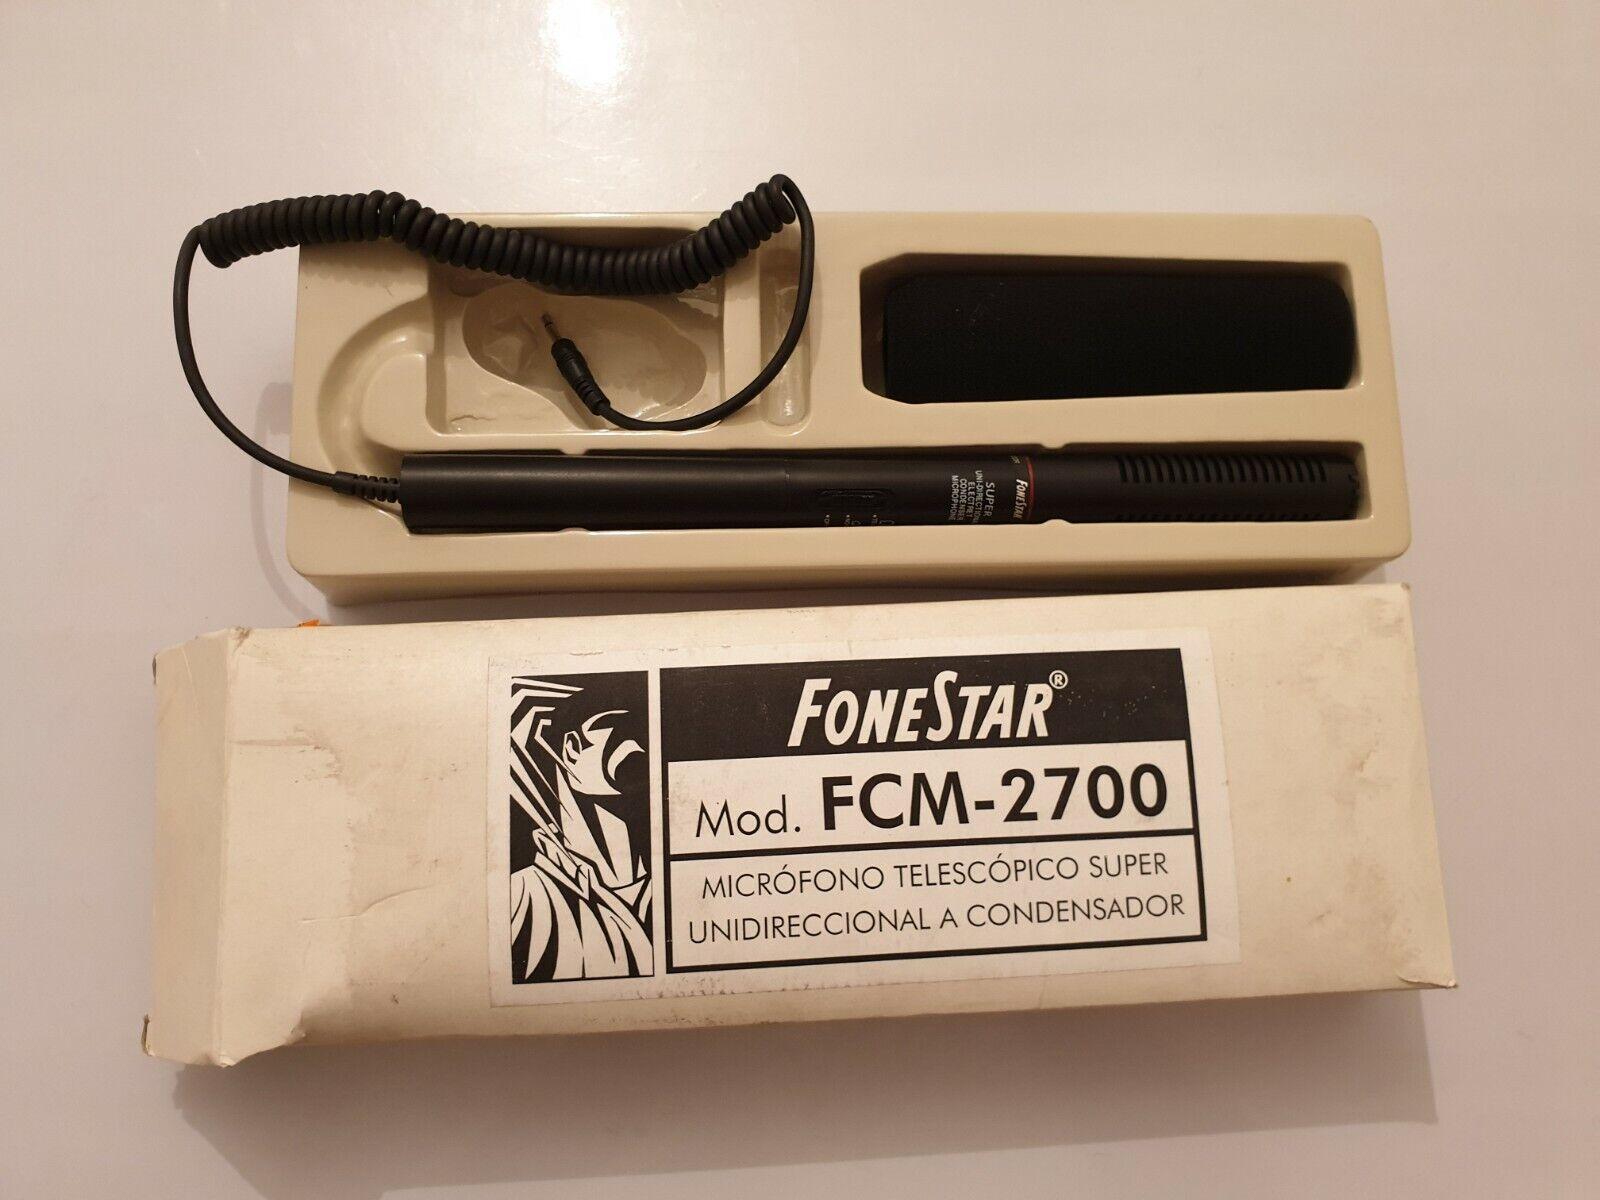 Microfono FoneStar mod.FCM-2700 telescopico Super unidireccional a condensador